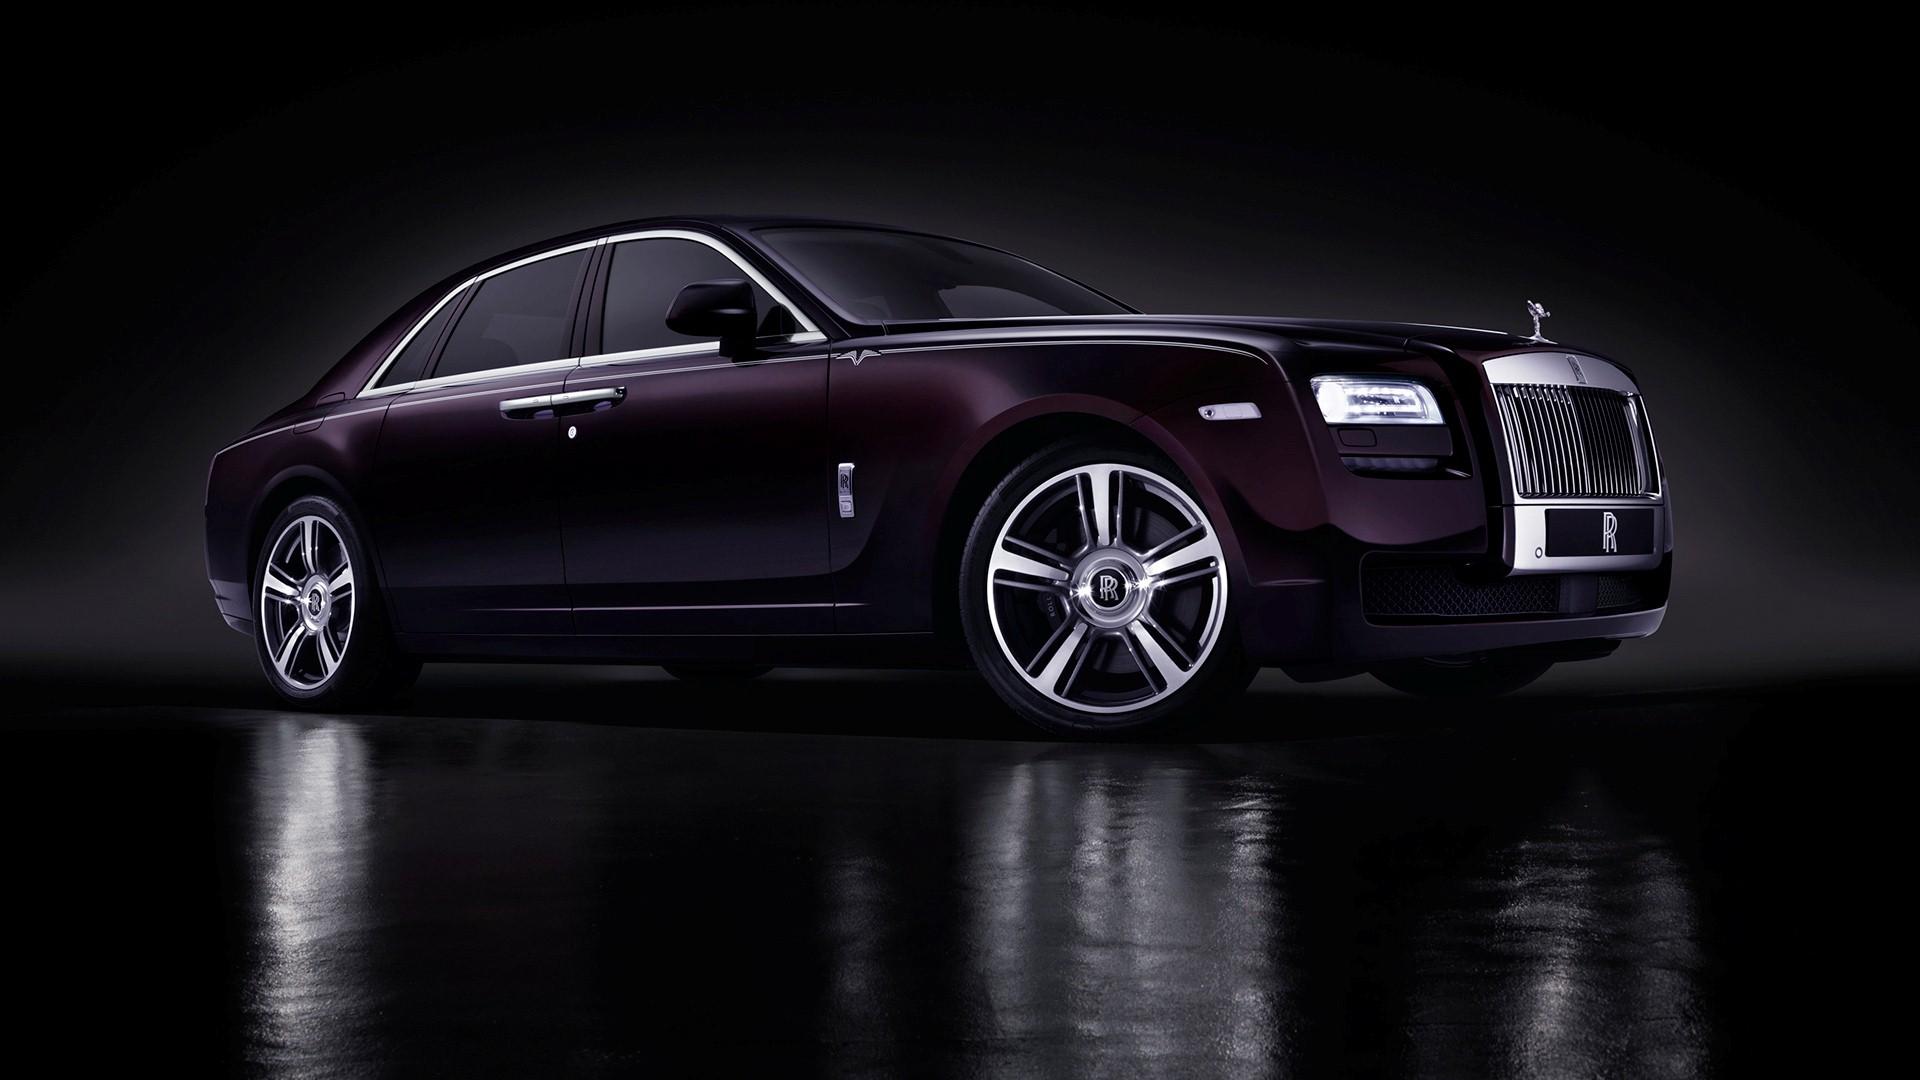 All Car Wallpaper Download Black Rolls Royce Ghost Royal 2015